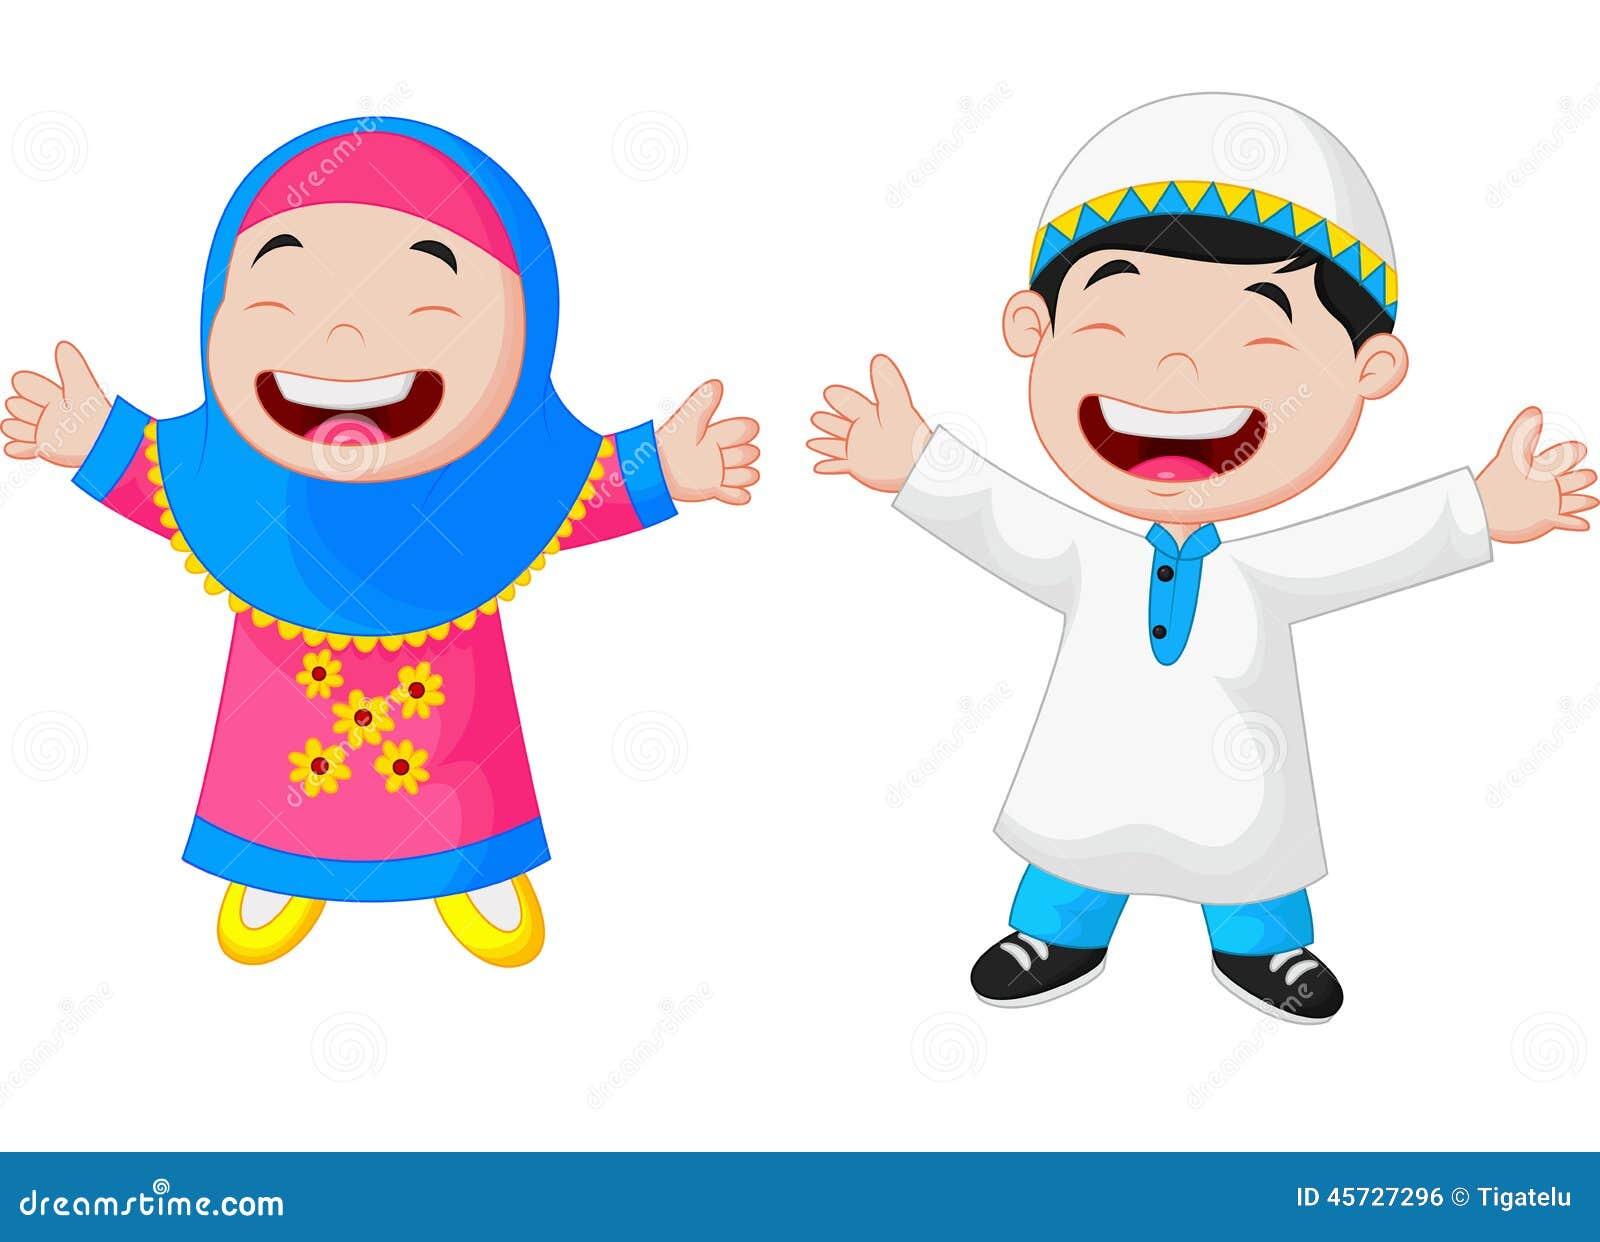 Happy Muslim Kid Cartoon Stock Vector - Image: 45727296